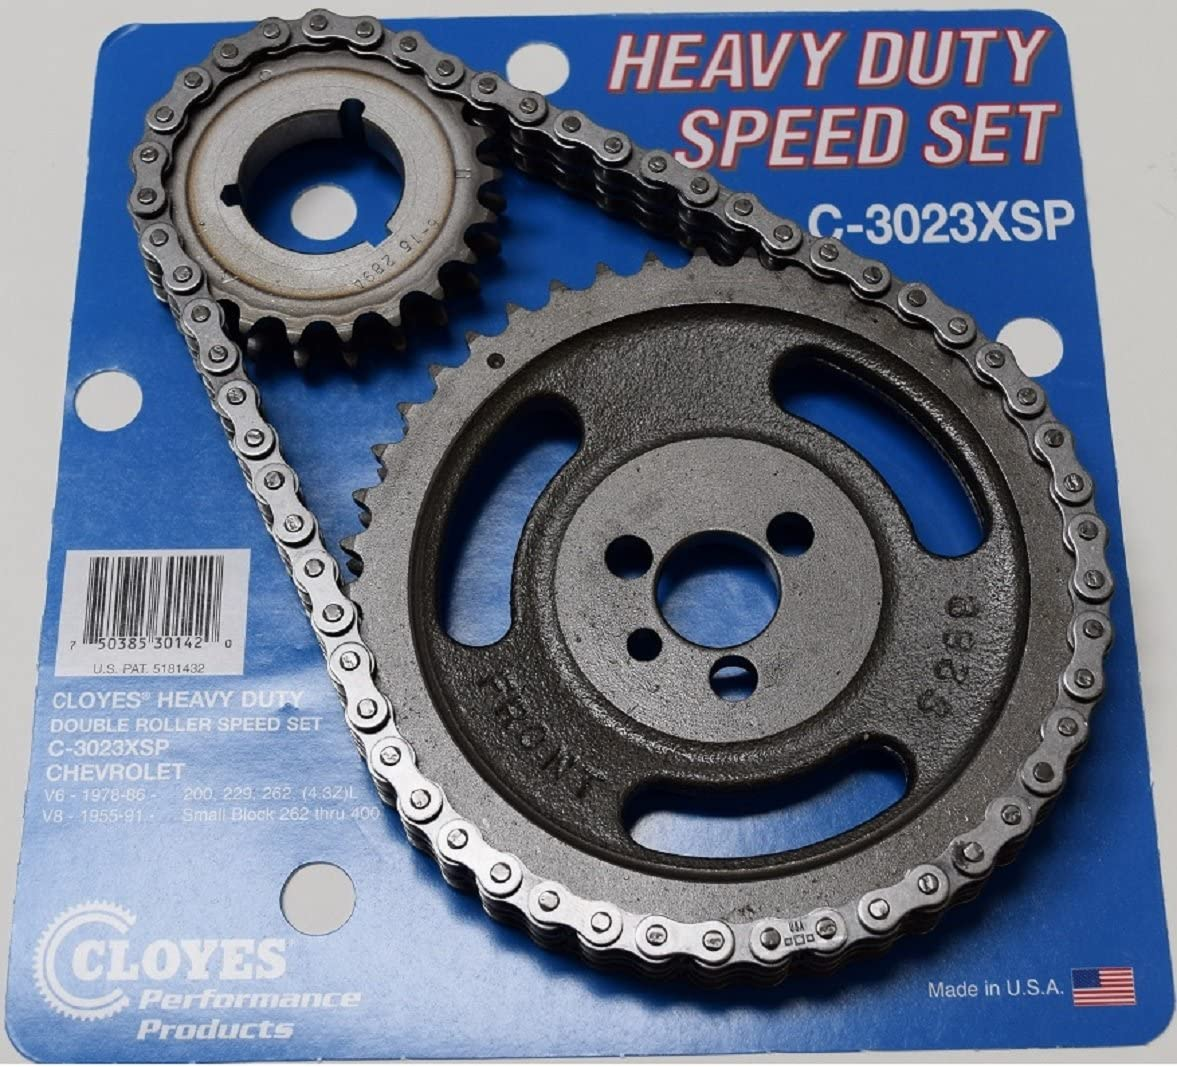 CHEVY SBC 350 5.7L HP RV 447//447 CAMSHAFT LIFTERS /& ADJUSTABLE TIMING KIT L-79 327 3863151